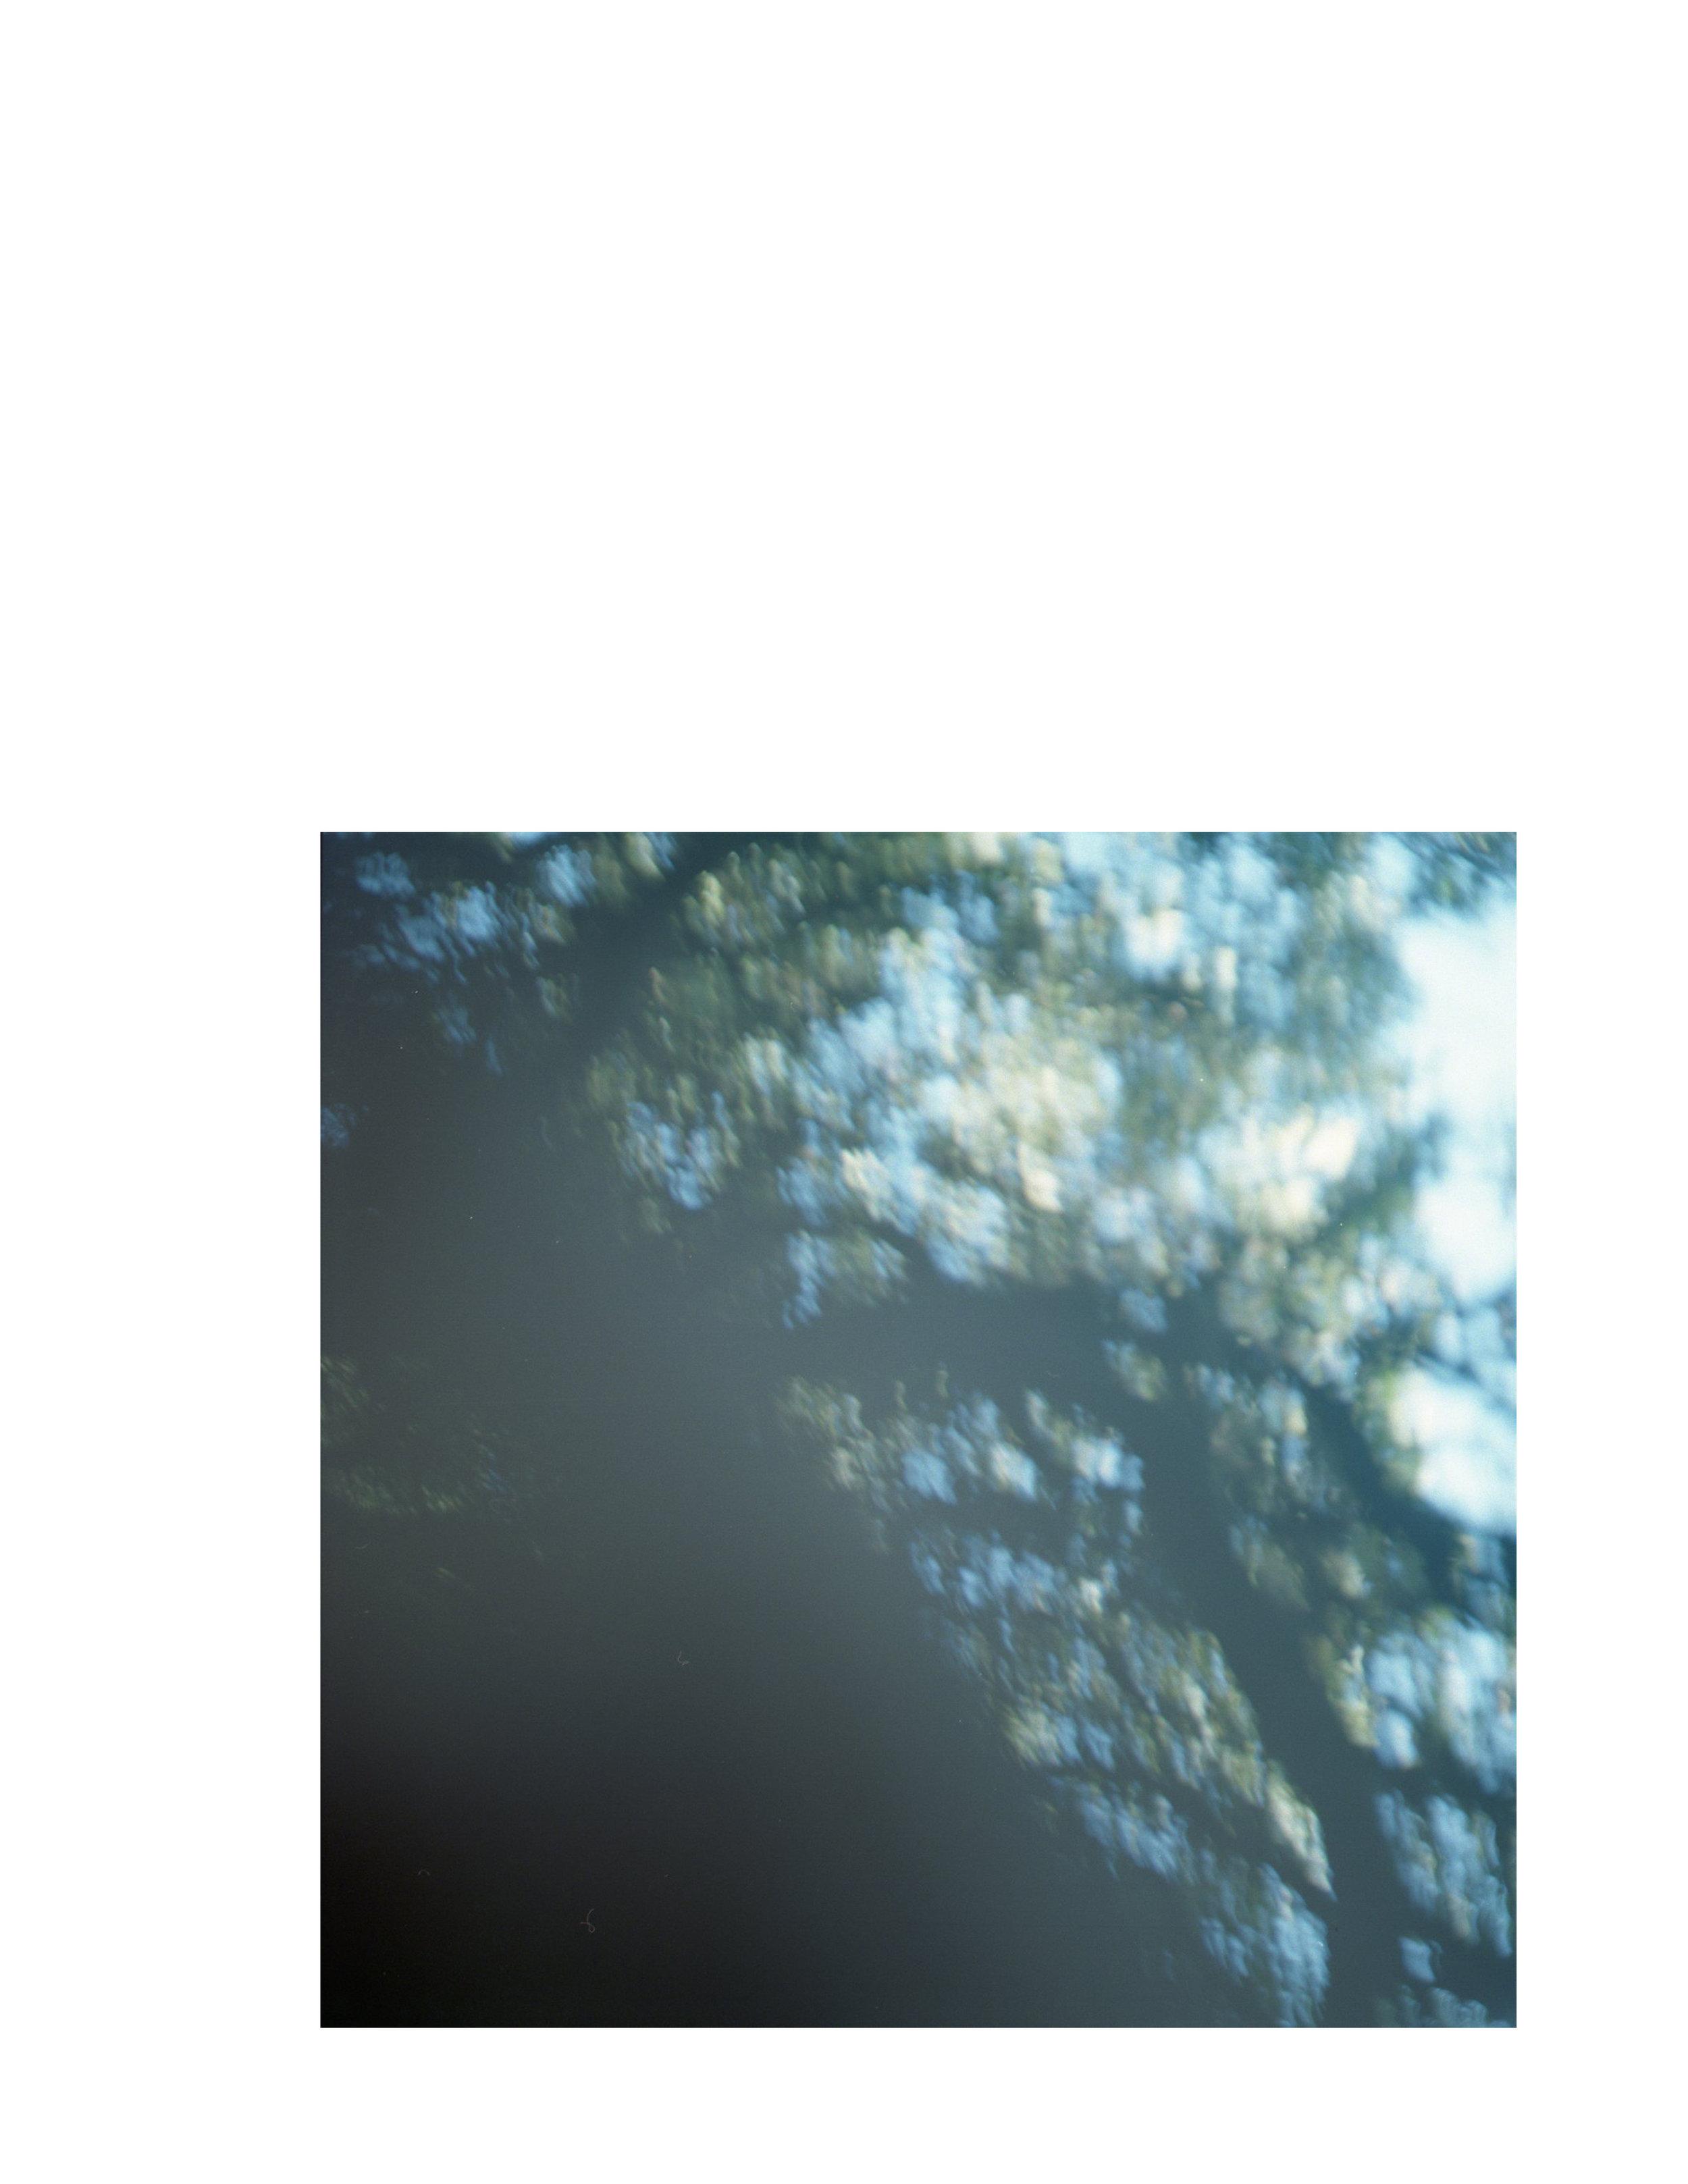 p11.jpg